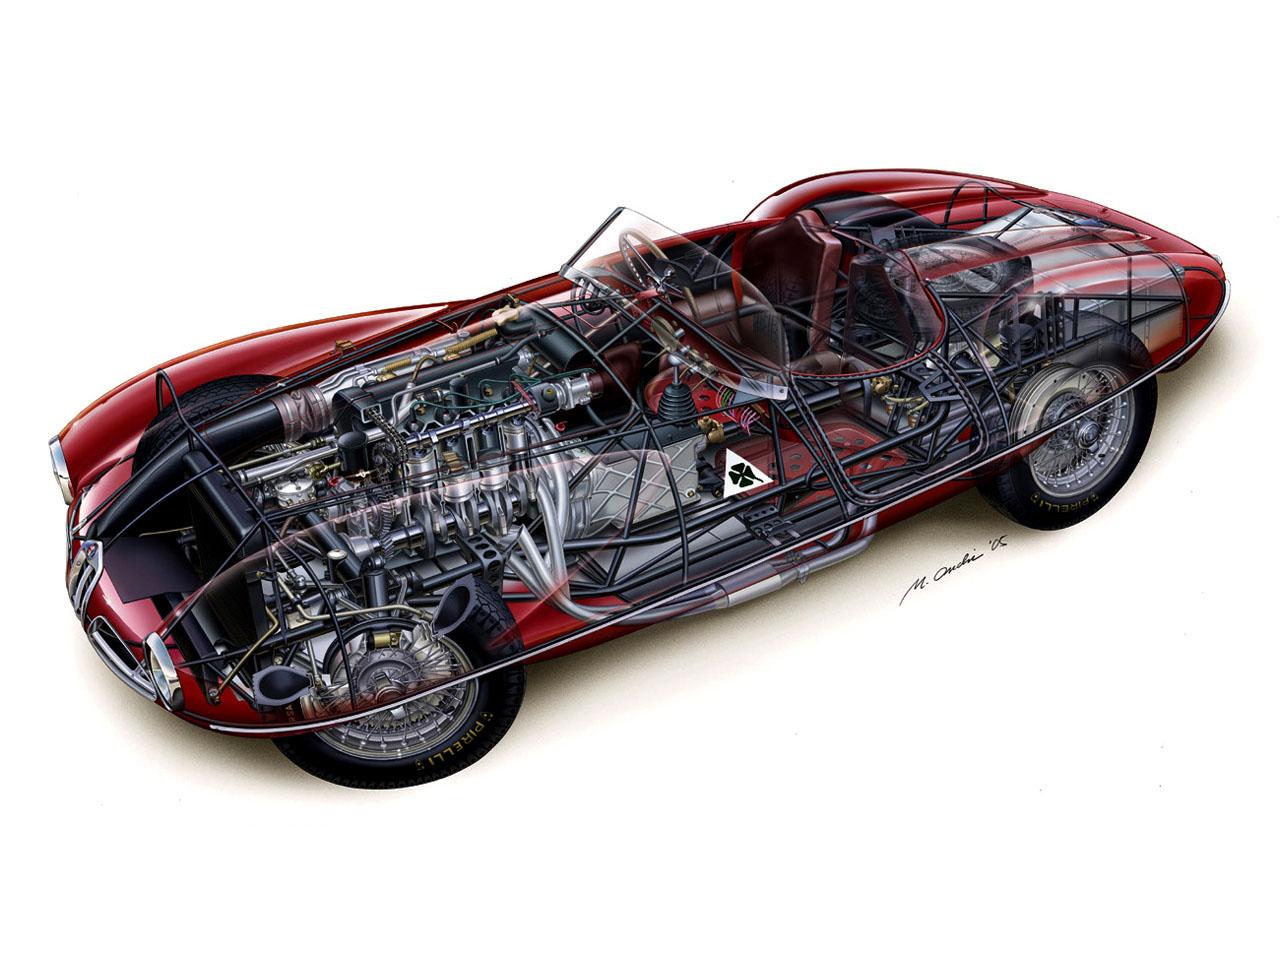 Alfa Romeo 1900 C52 Disco Volante Spider 1359 1952 Alfa